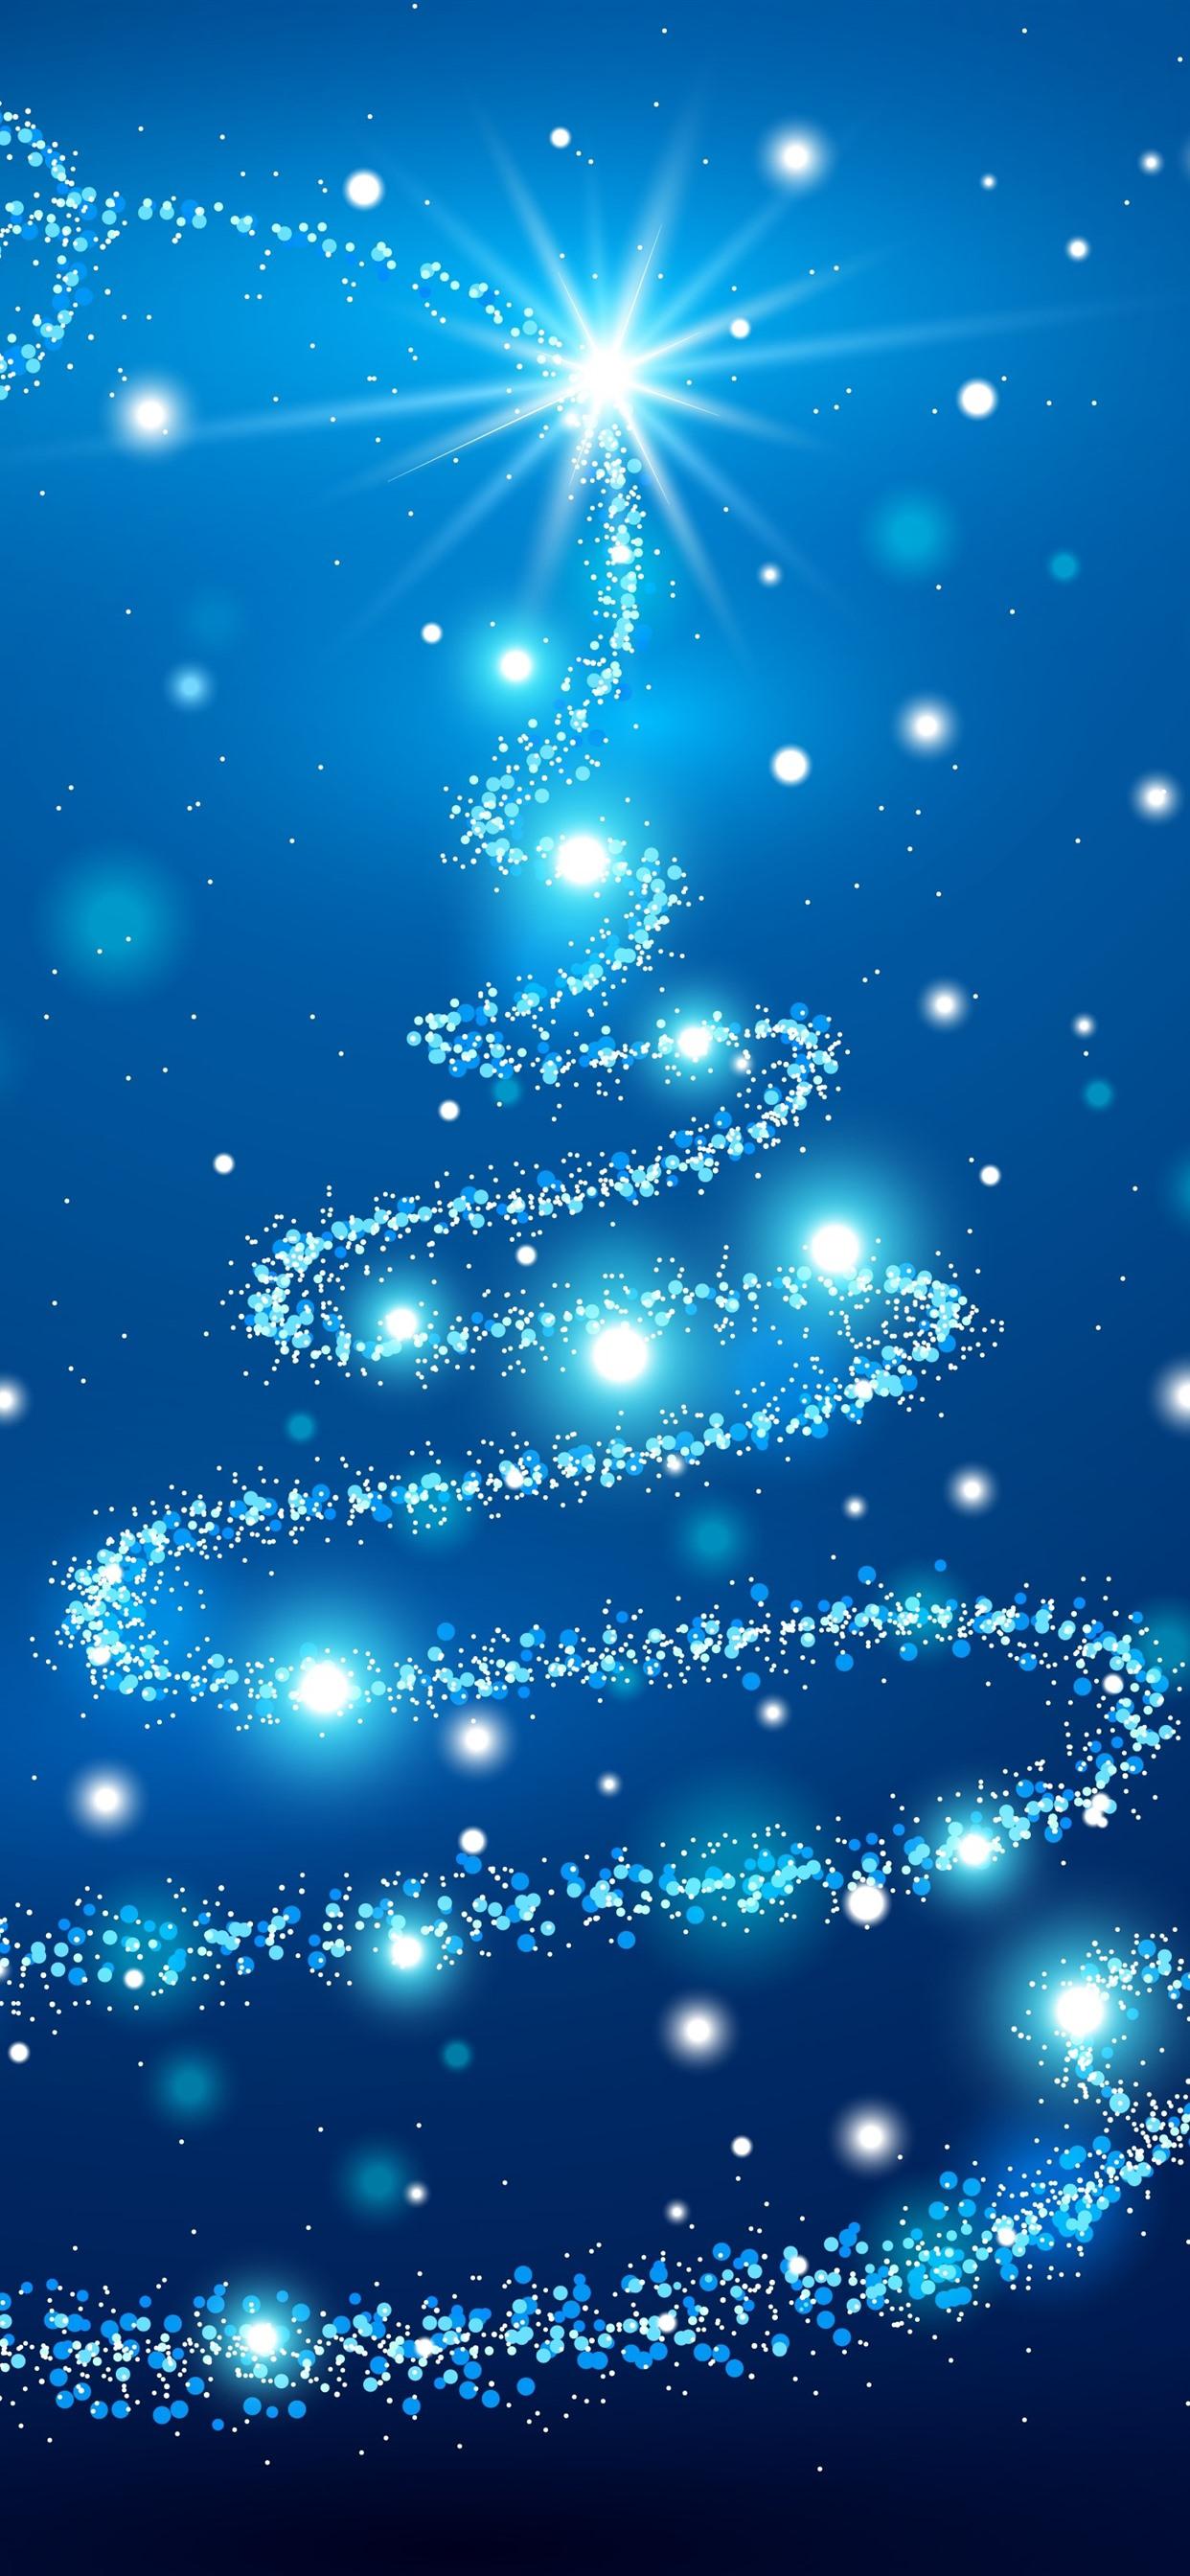 Iphone Wallpaper Blue Christmas Tree, Shine, Stars - Iphone Xs Wallpaper Christmas , HD Wallpaper & Backgrounds